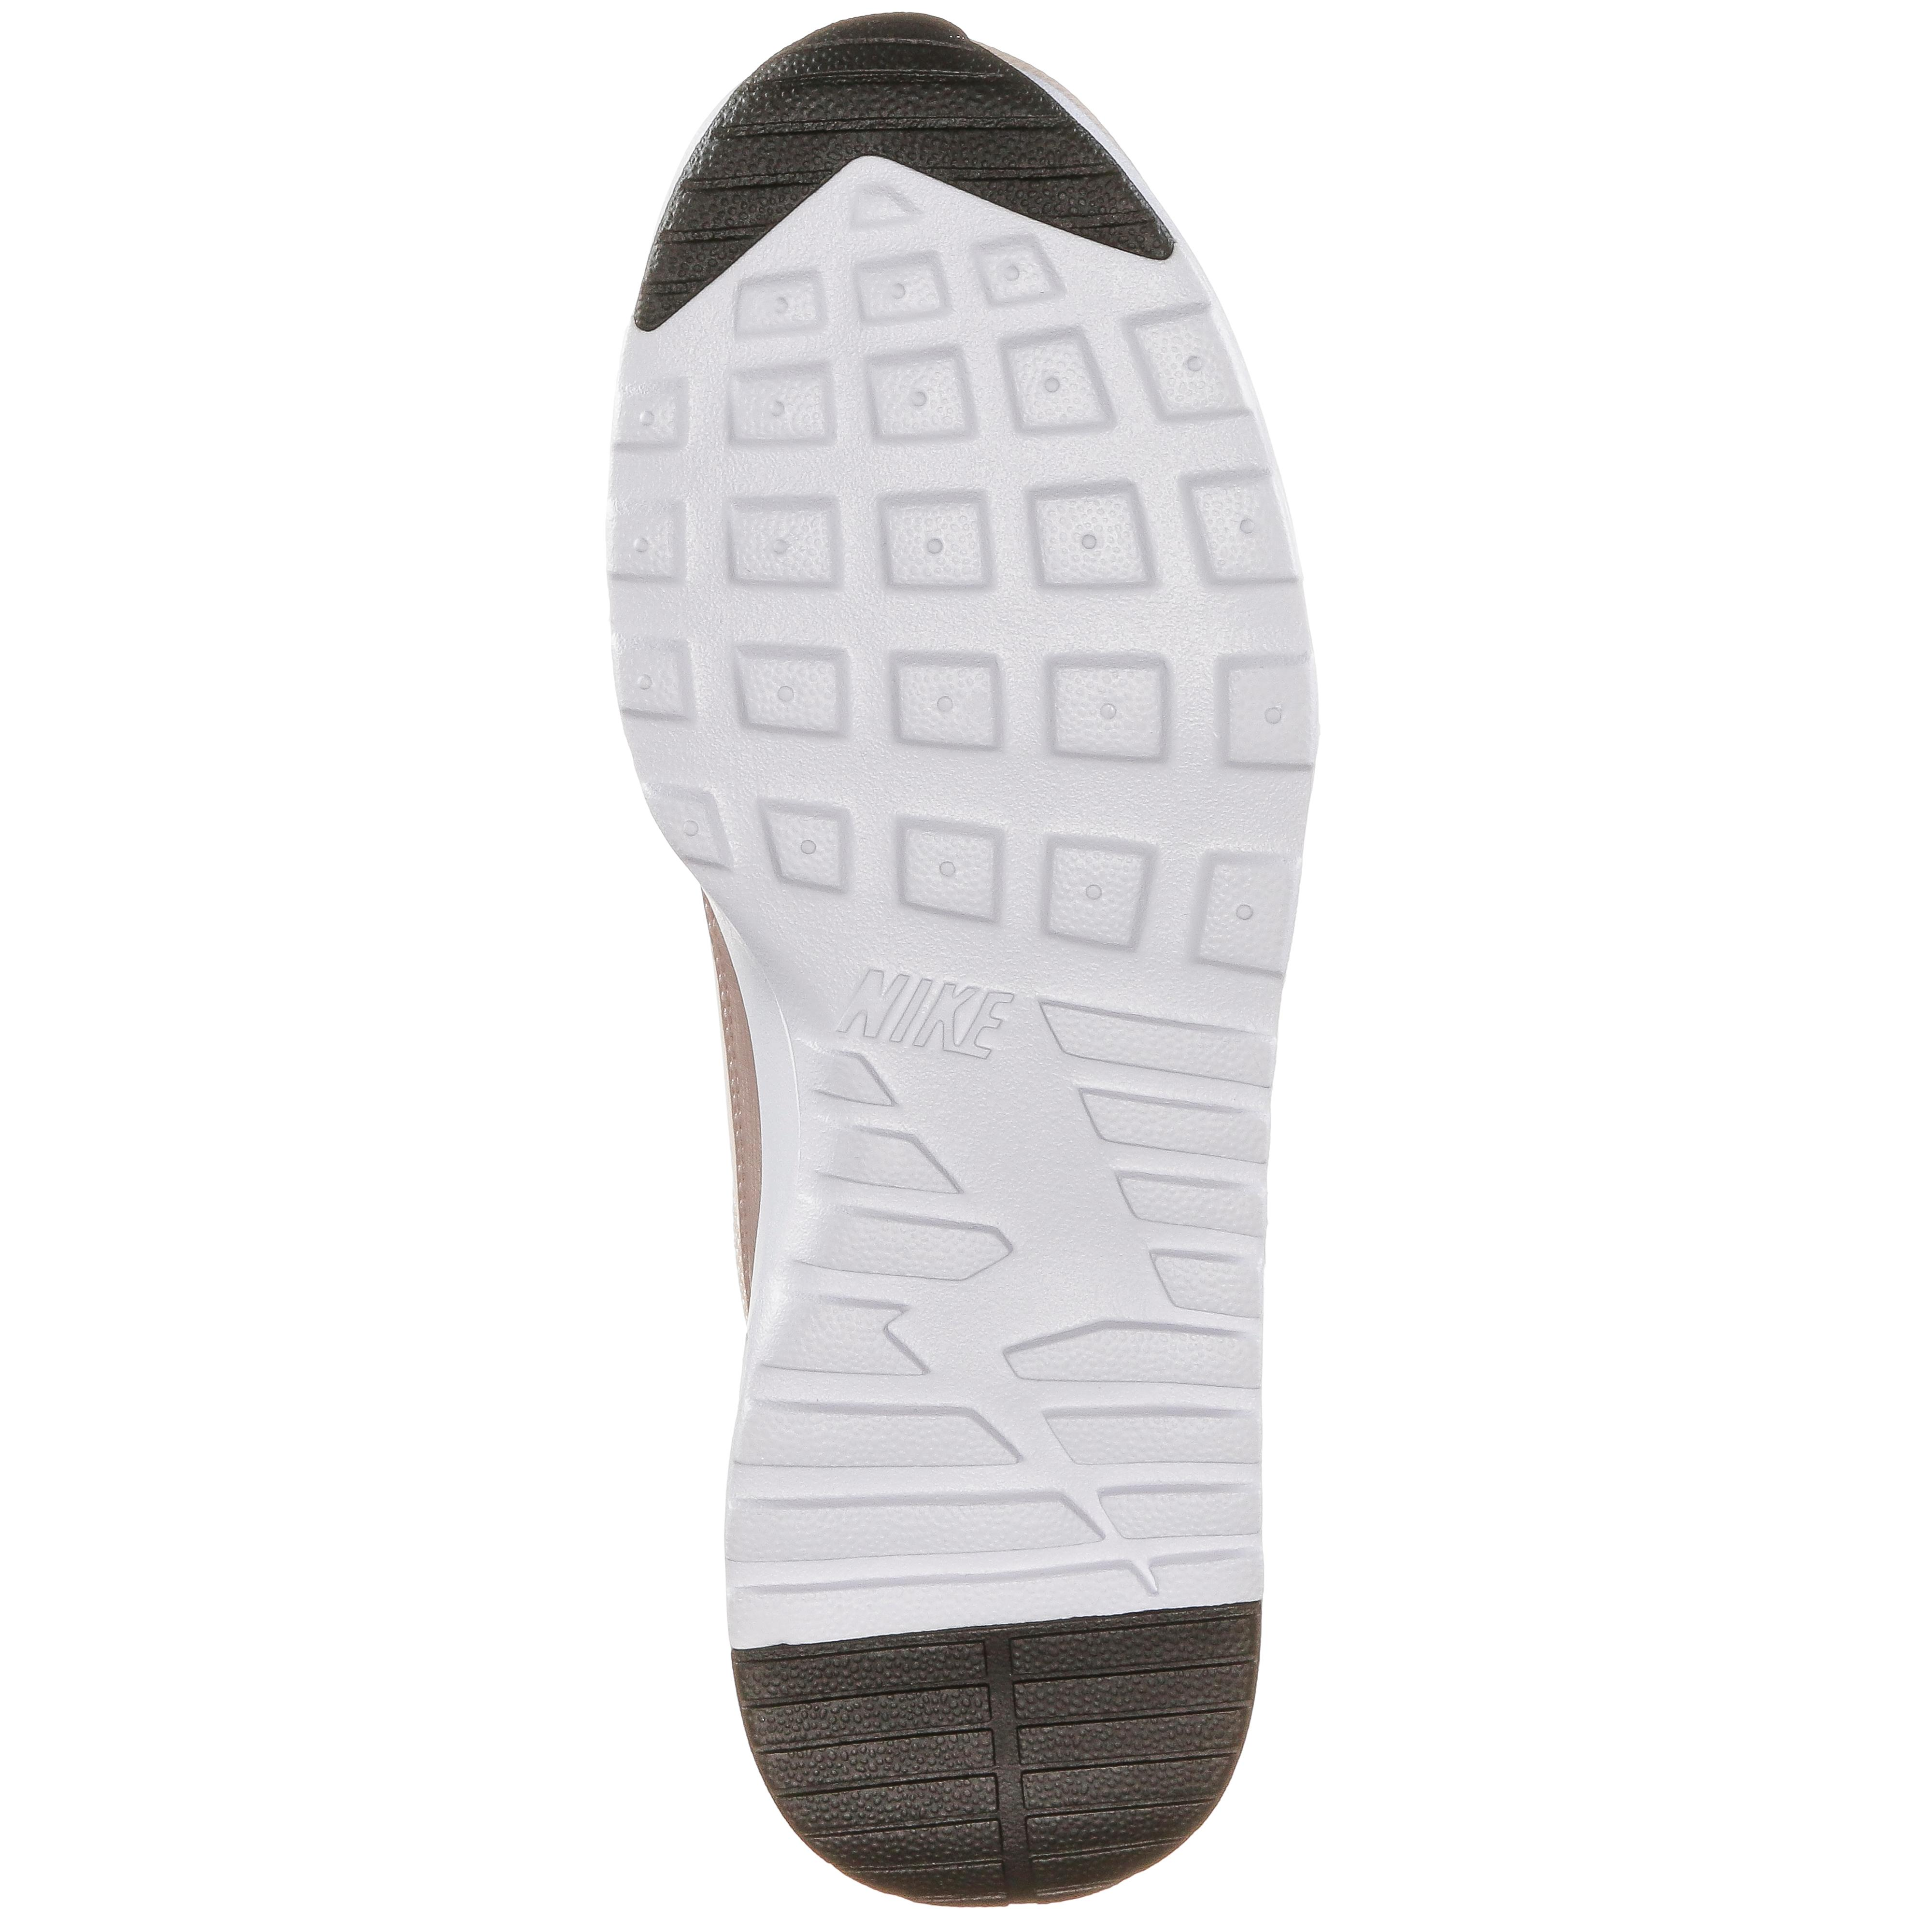 6d273d716d555f Nike AIR MAX THEA Sneaker Damen guava ice-guava ice-diffused taupe im  Online Shop von SportScheck kaufen